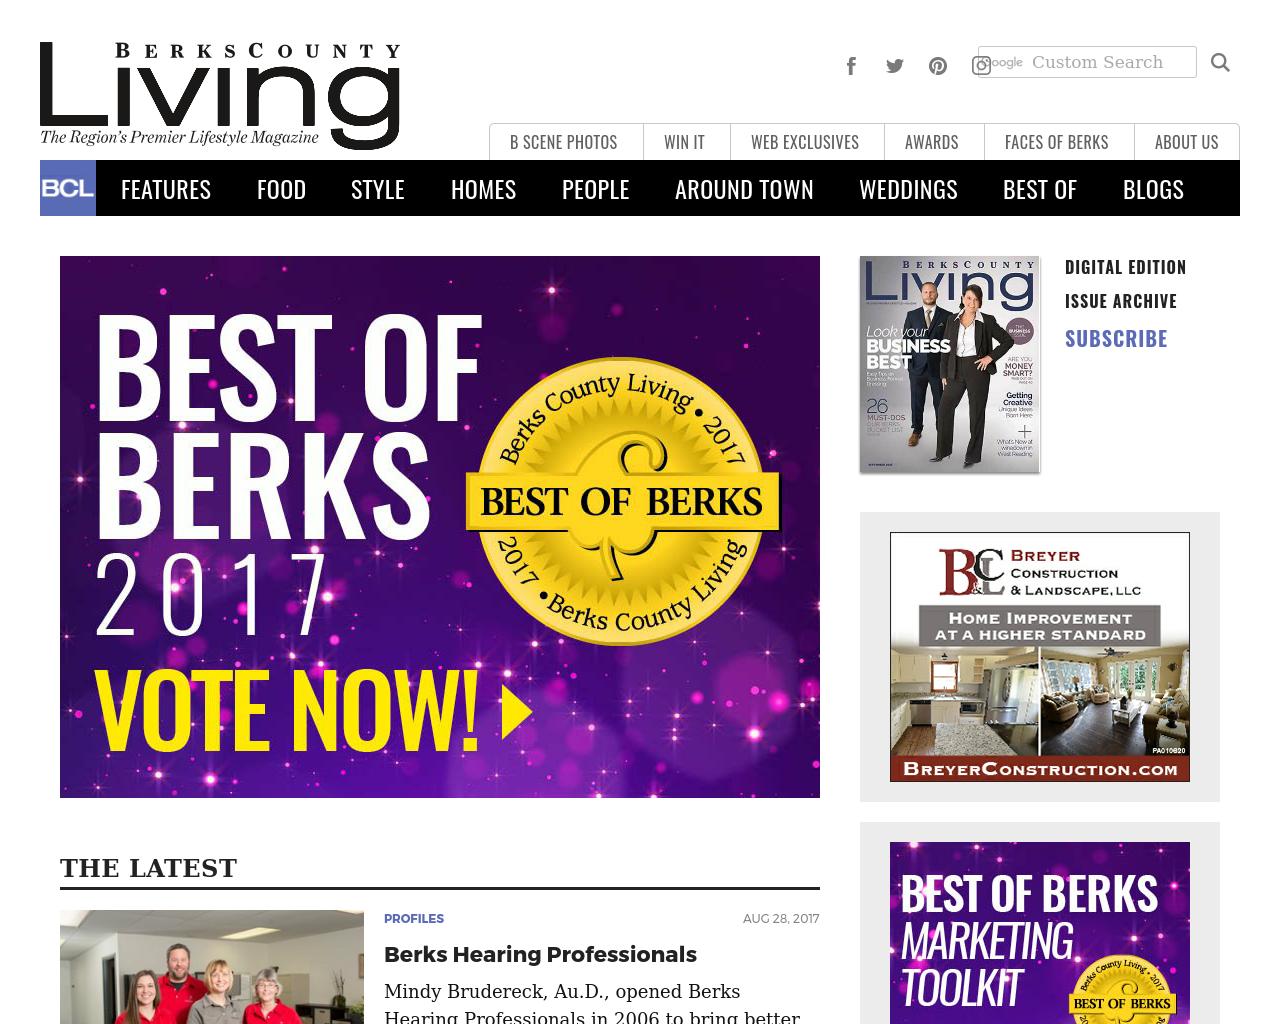 Berks-County-Living-Advertising-Reviews-Pricing